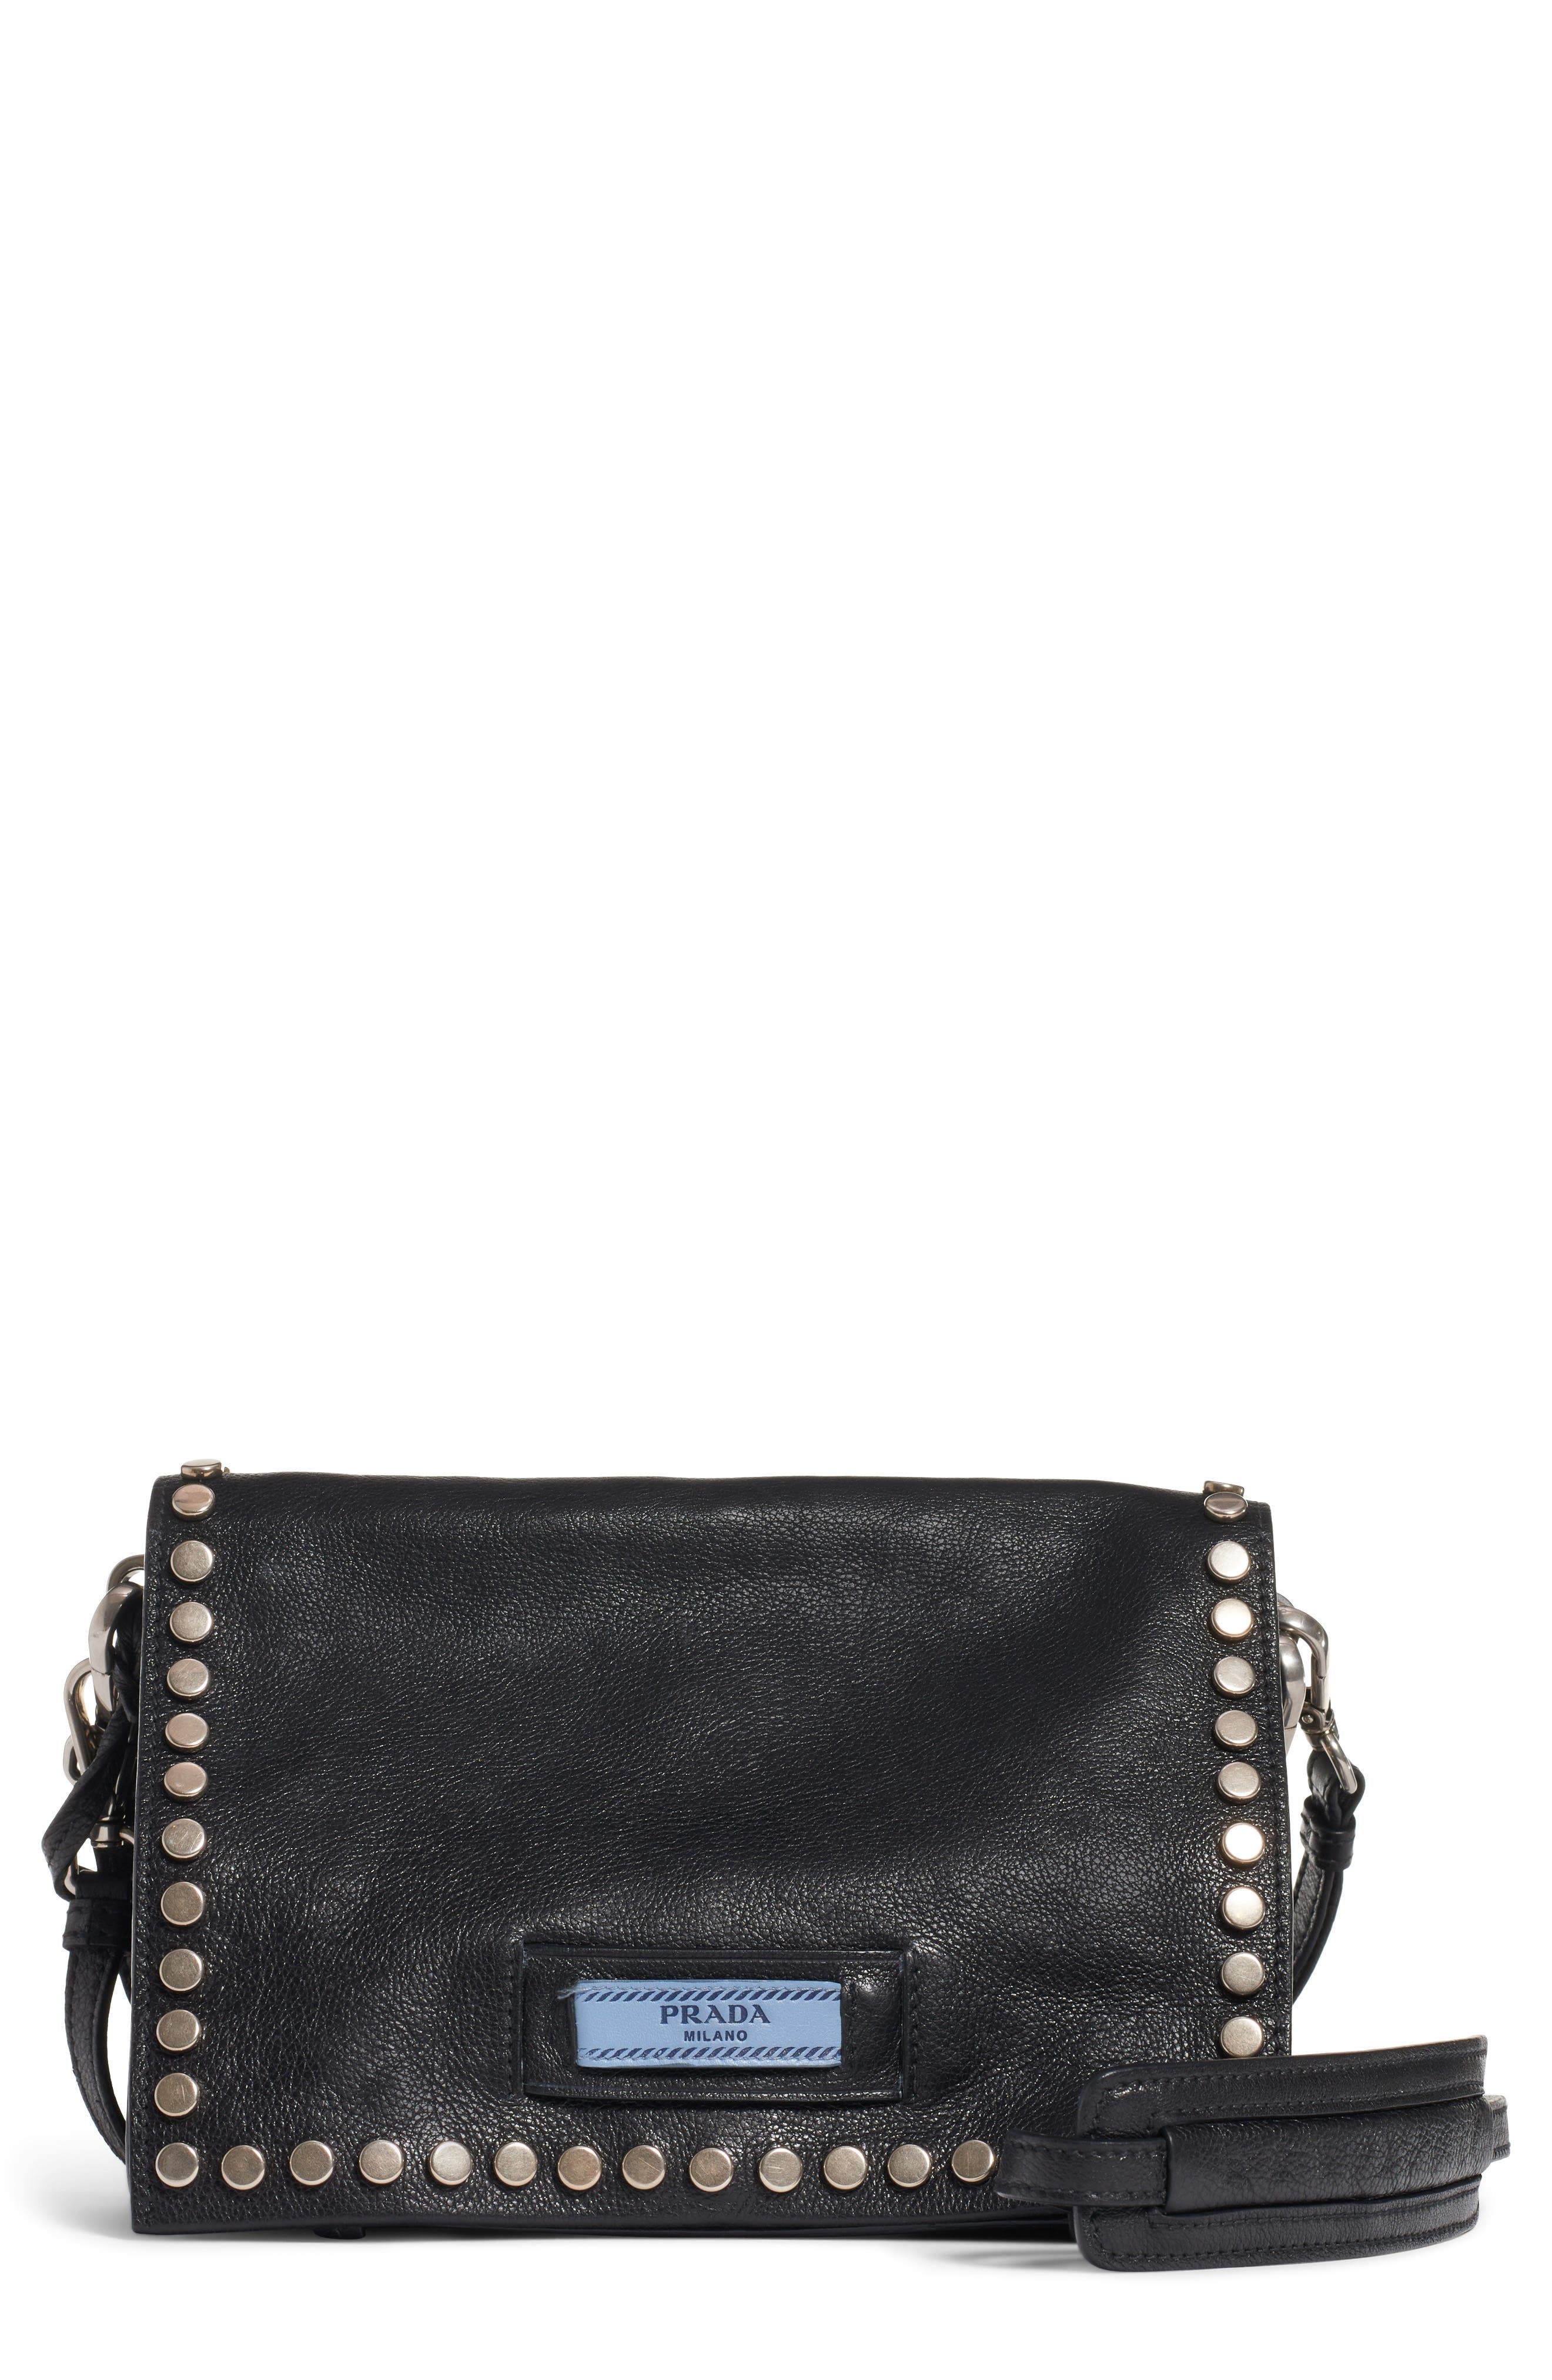 PRADA Small Stud Etiquette Shoulder Bag, Main, color, NERO/ ASTRALE